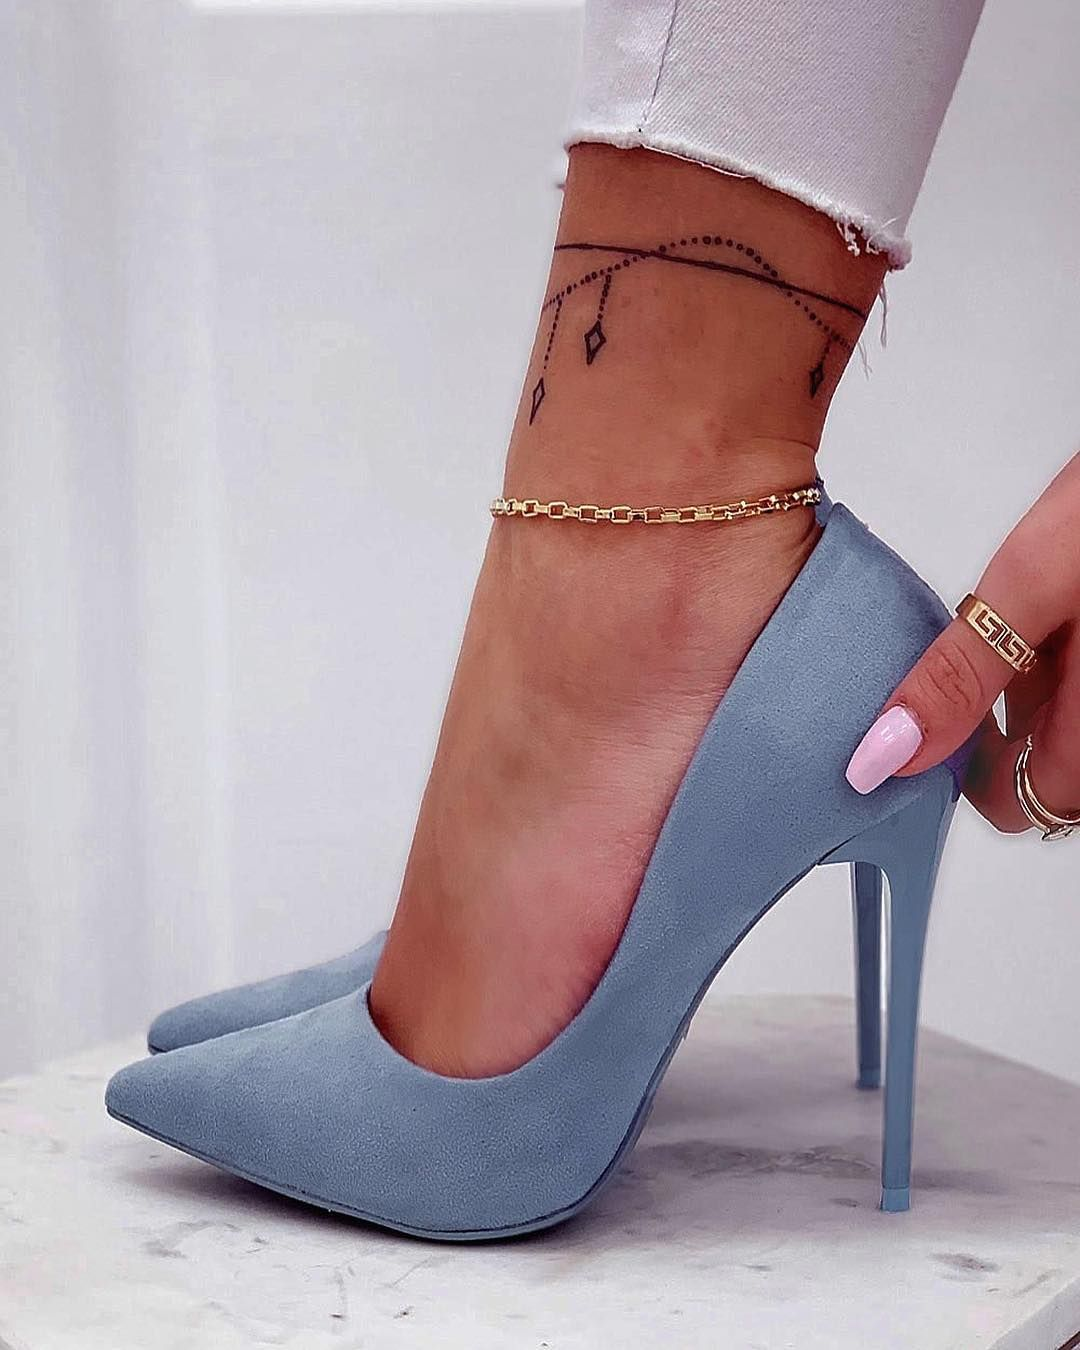 New Pastel Decollete Www Alexoo It Code Rx 13 Shoes Shoes Scarpedonna Scarpeonline Shoesaddi Trending Fashion Shoes Heels Womens Shoes Wedges